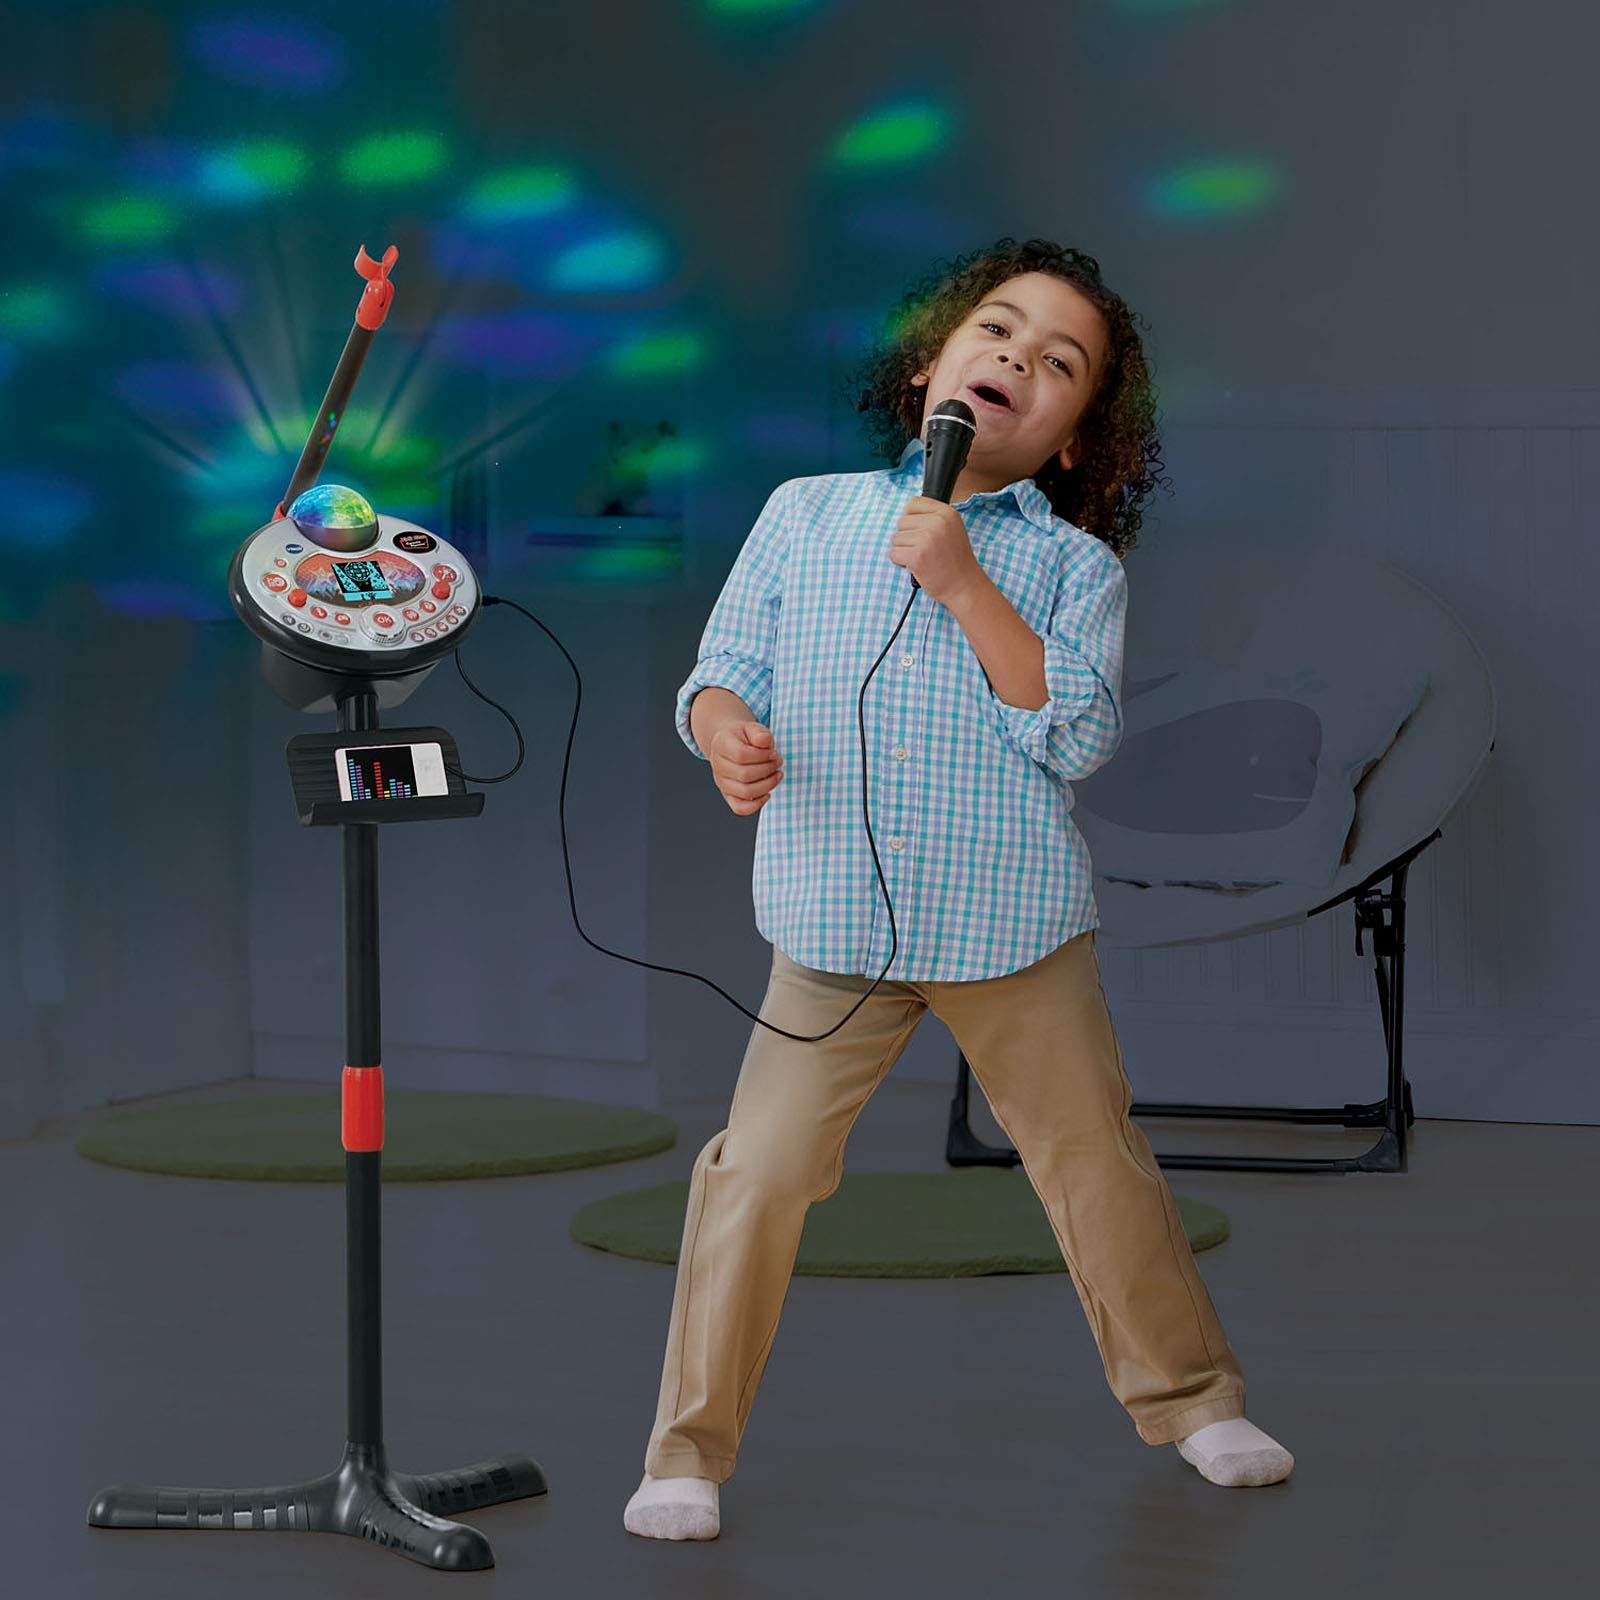 VTech Kidi Star Karaoke Machine (Black) (Renewed) by VTech (Image #5)